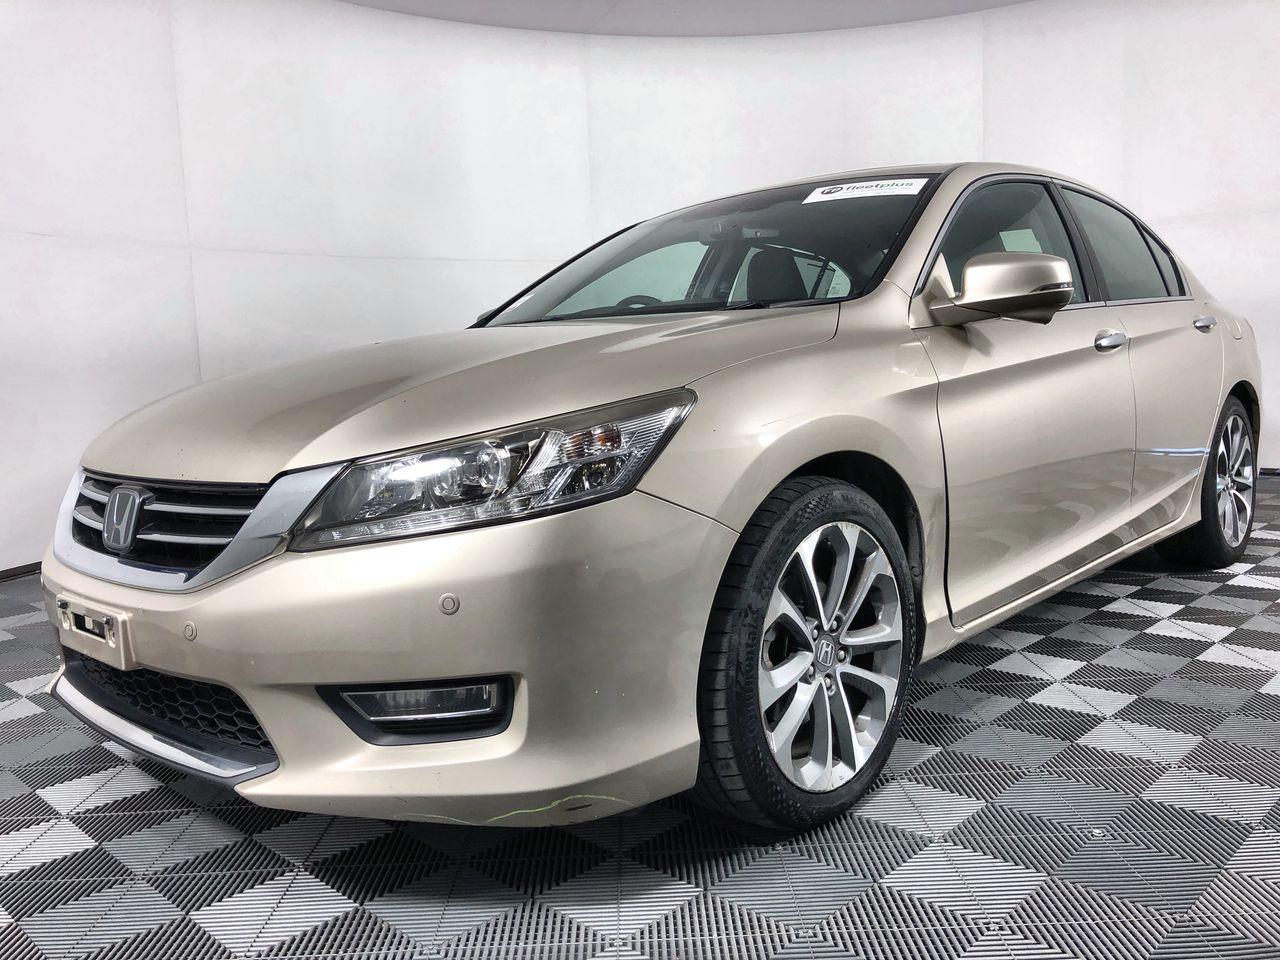 2013 Honda Accord V6-L 9TH GEN Automatic Sedan - Brisbane